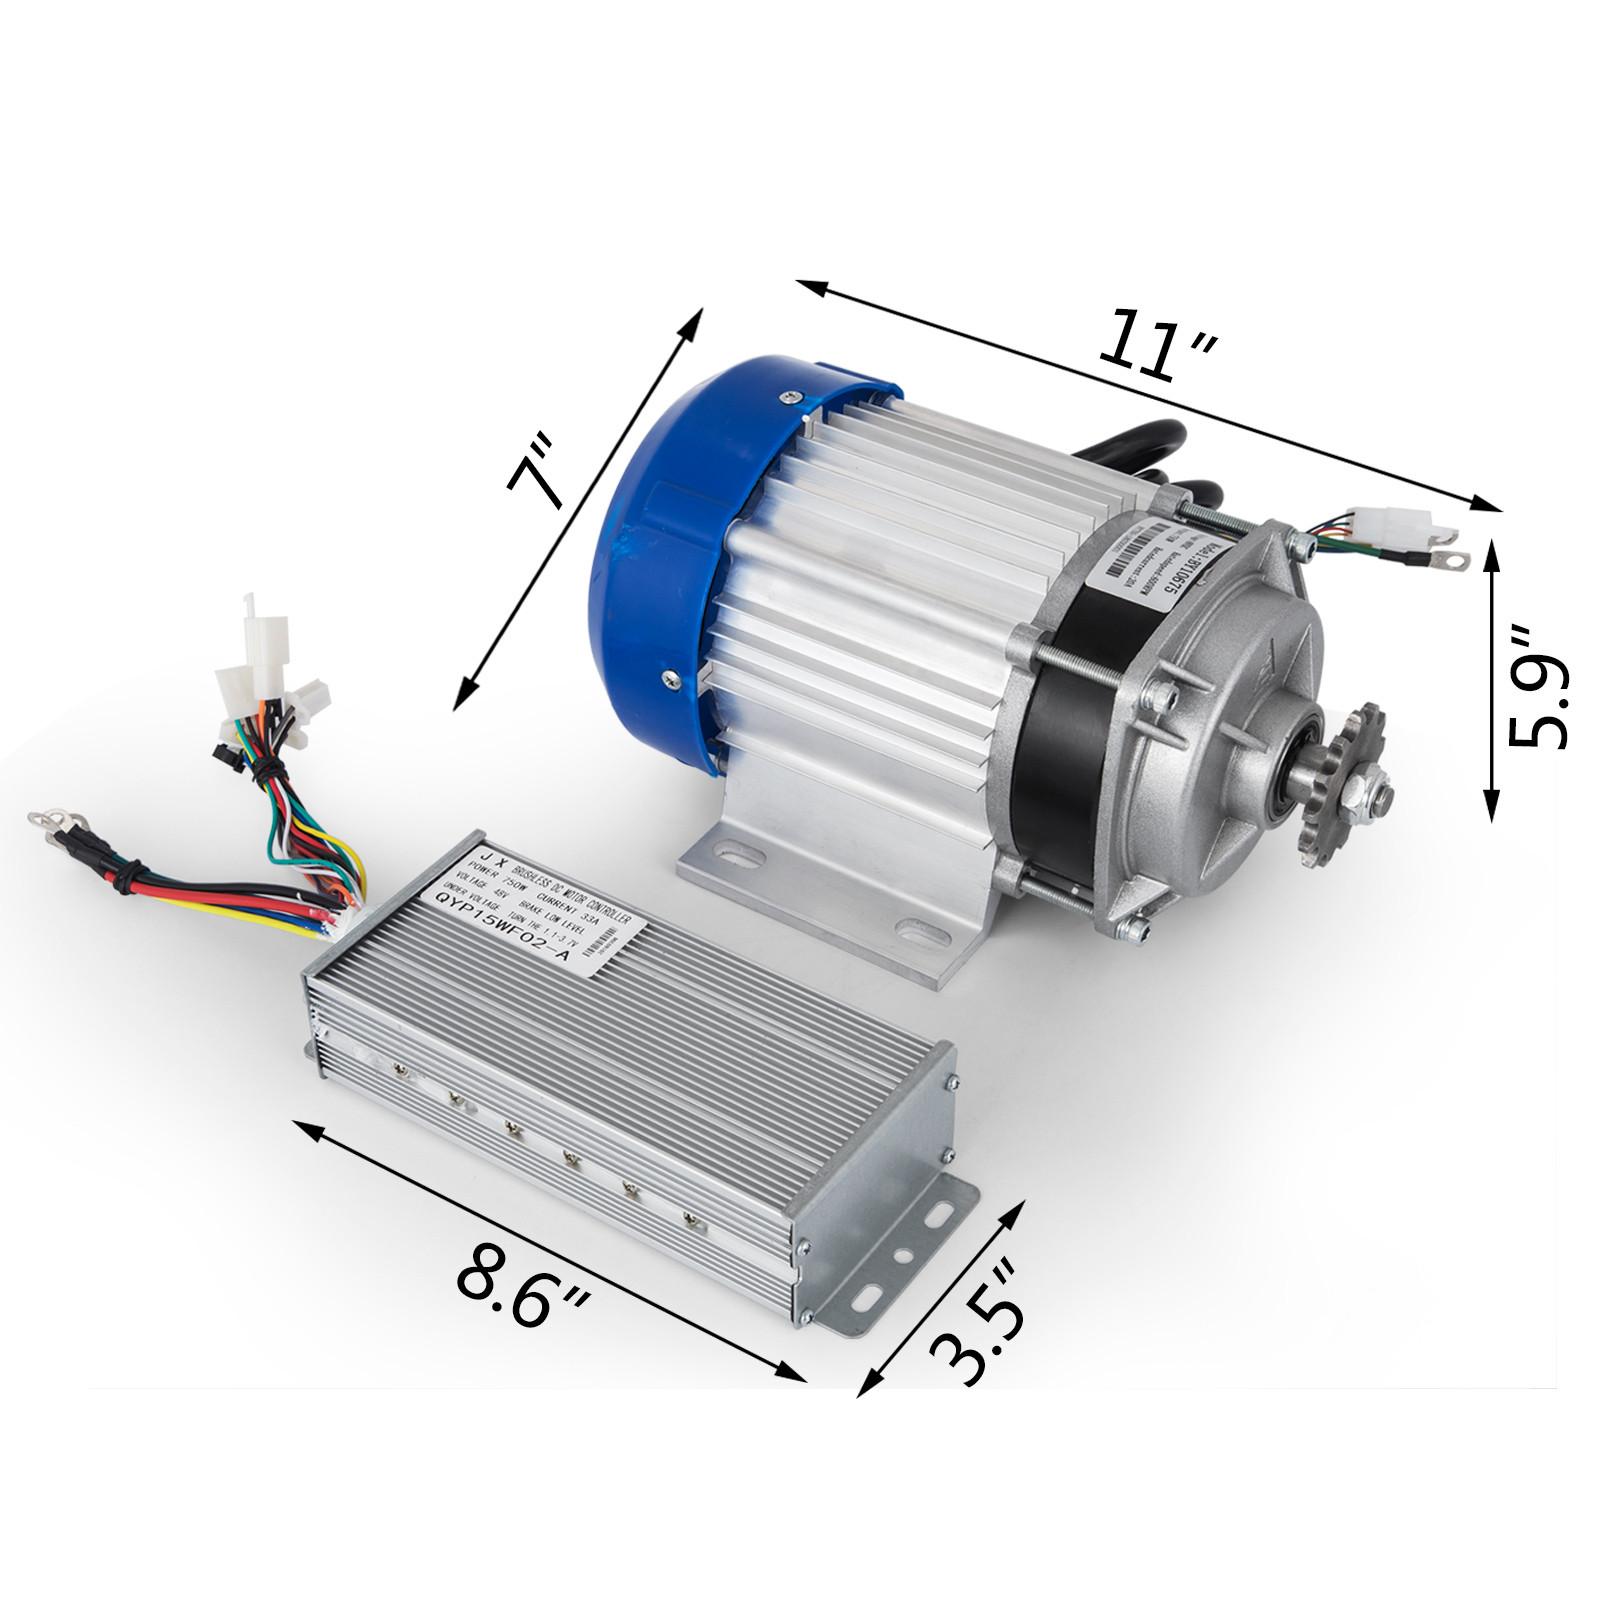 1800W-48V-DC-Brushless-Electric-Motor-Kit-f-Scooter-500-1800W-E-Bike-Go-Kart thumbnail 146